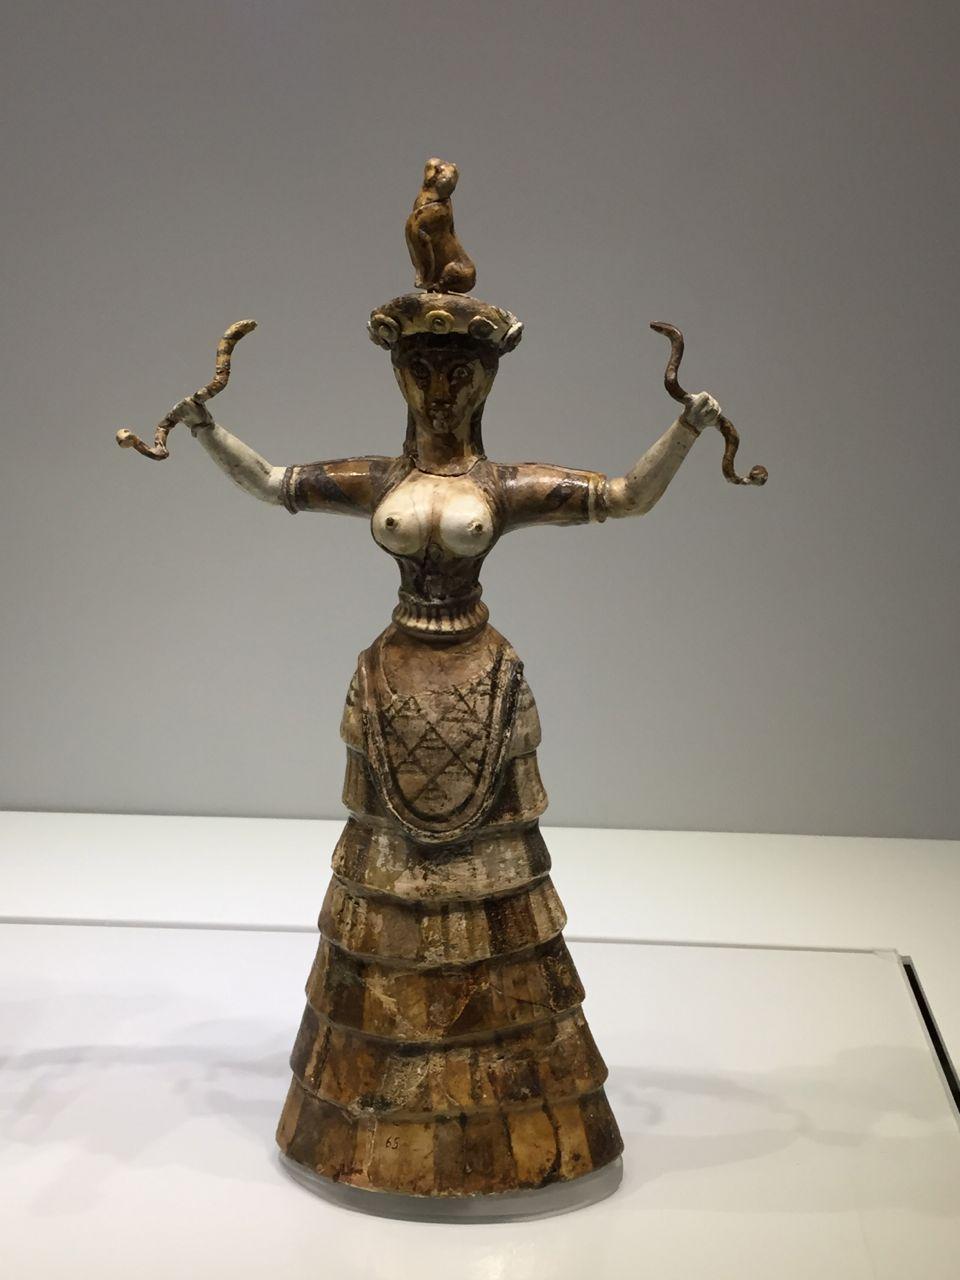 snake-statue-Heraklion-museum.jpg